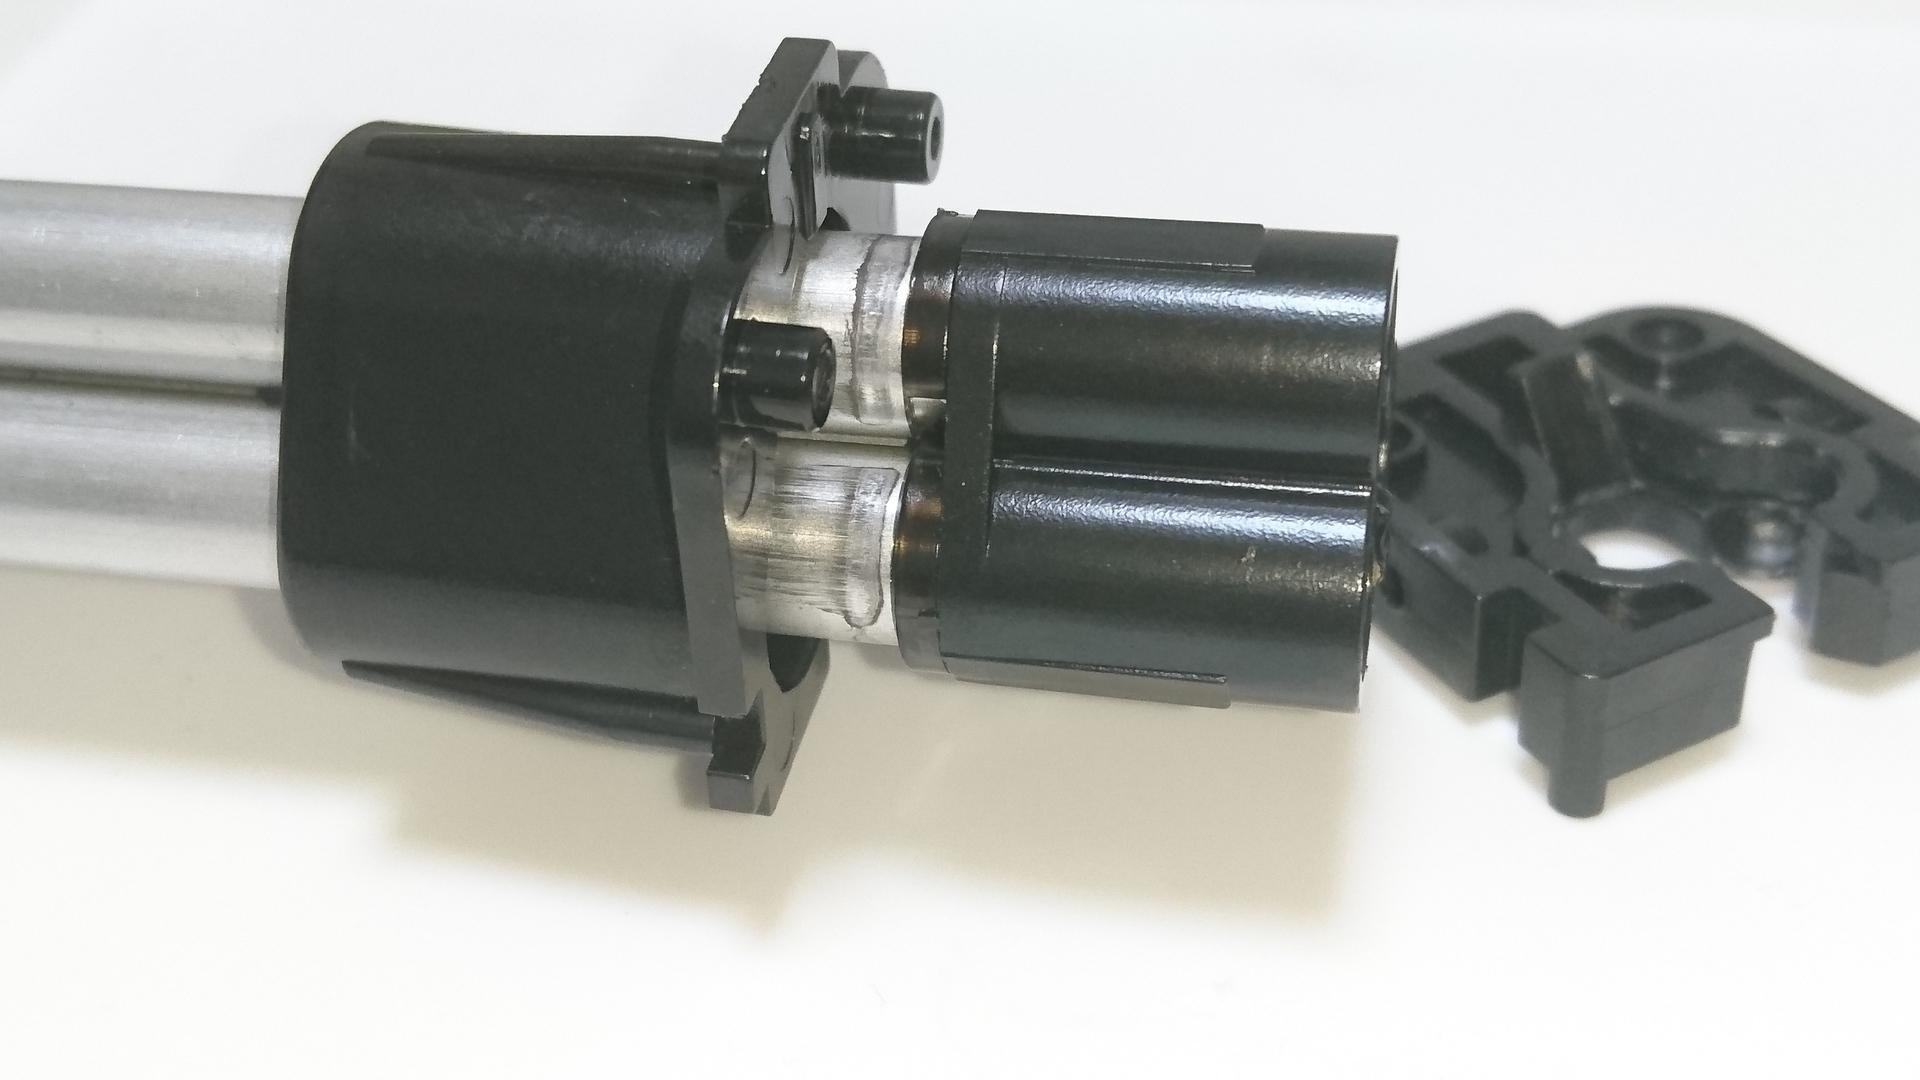 M3ショーティ インナーバレル交換 バレルベース取外